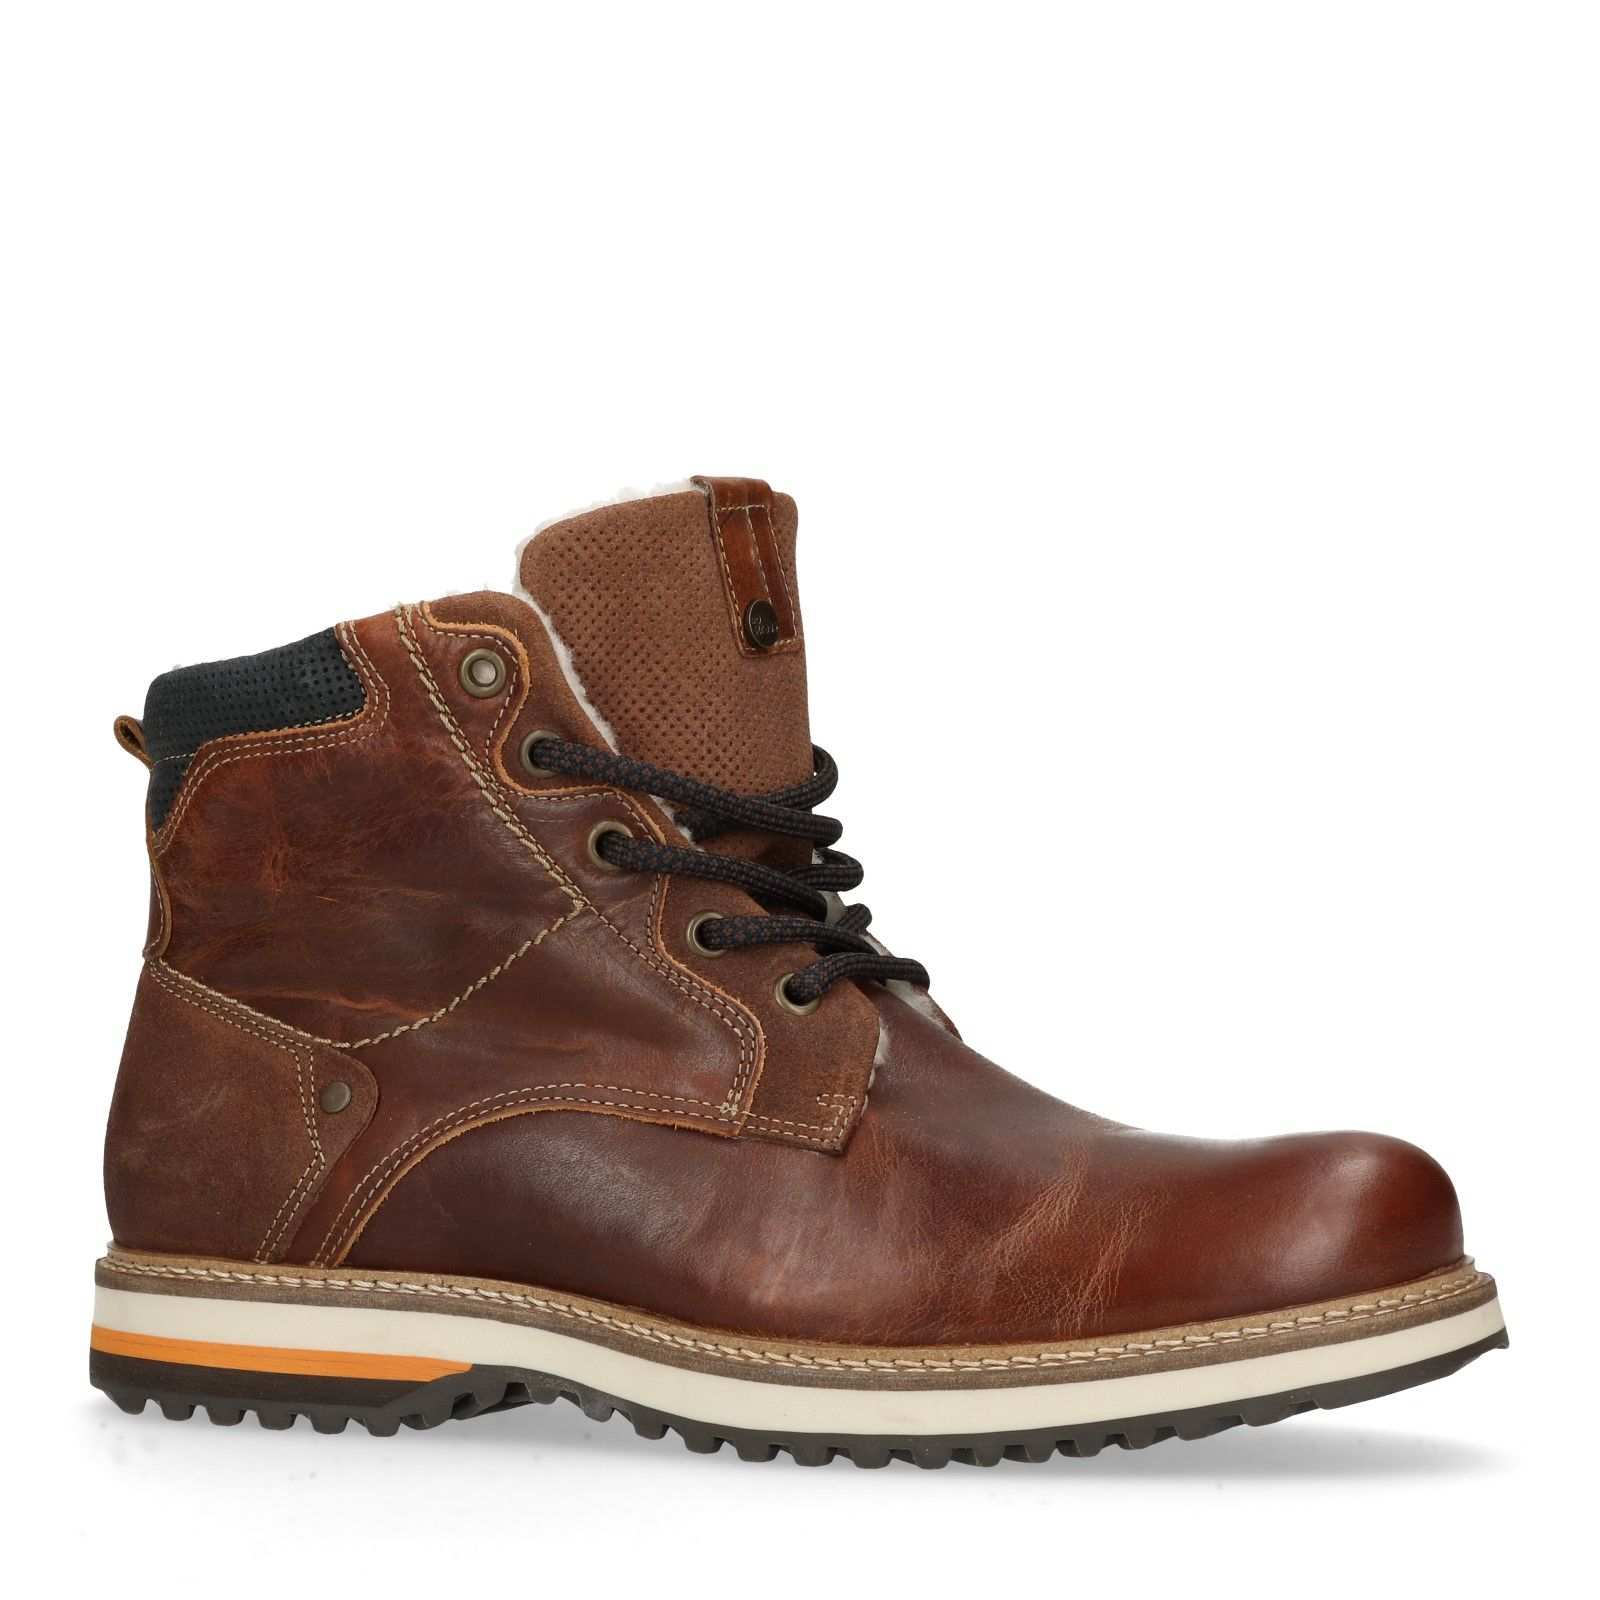 No Stress Cognacfarbene Worker Boots aus Leder